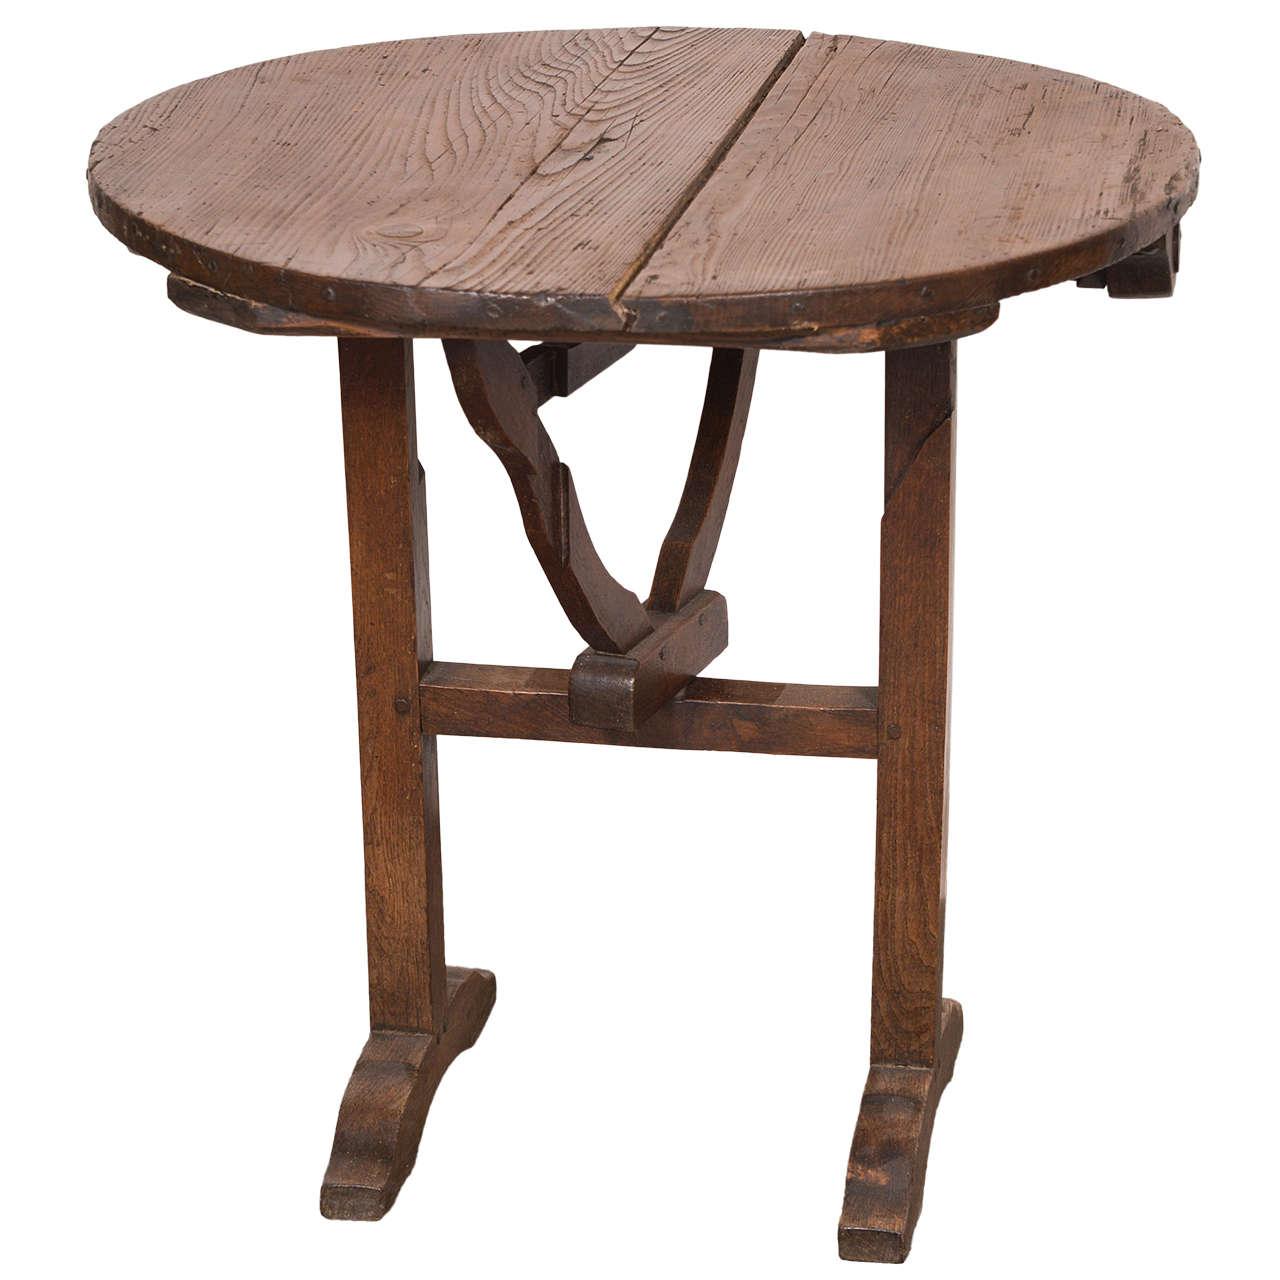 petite table vigneron at 1stdibs